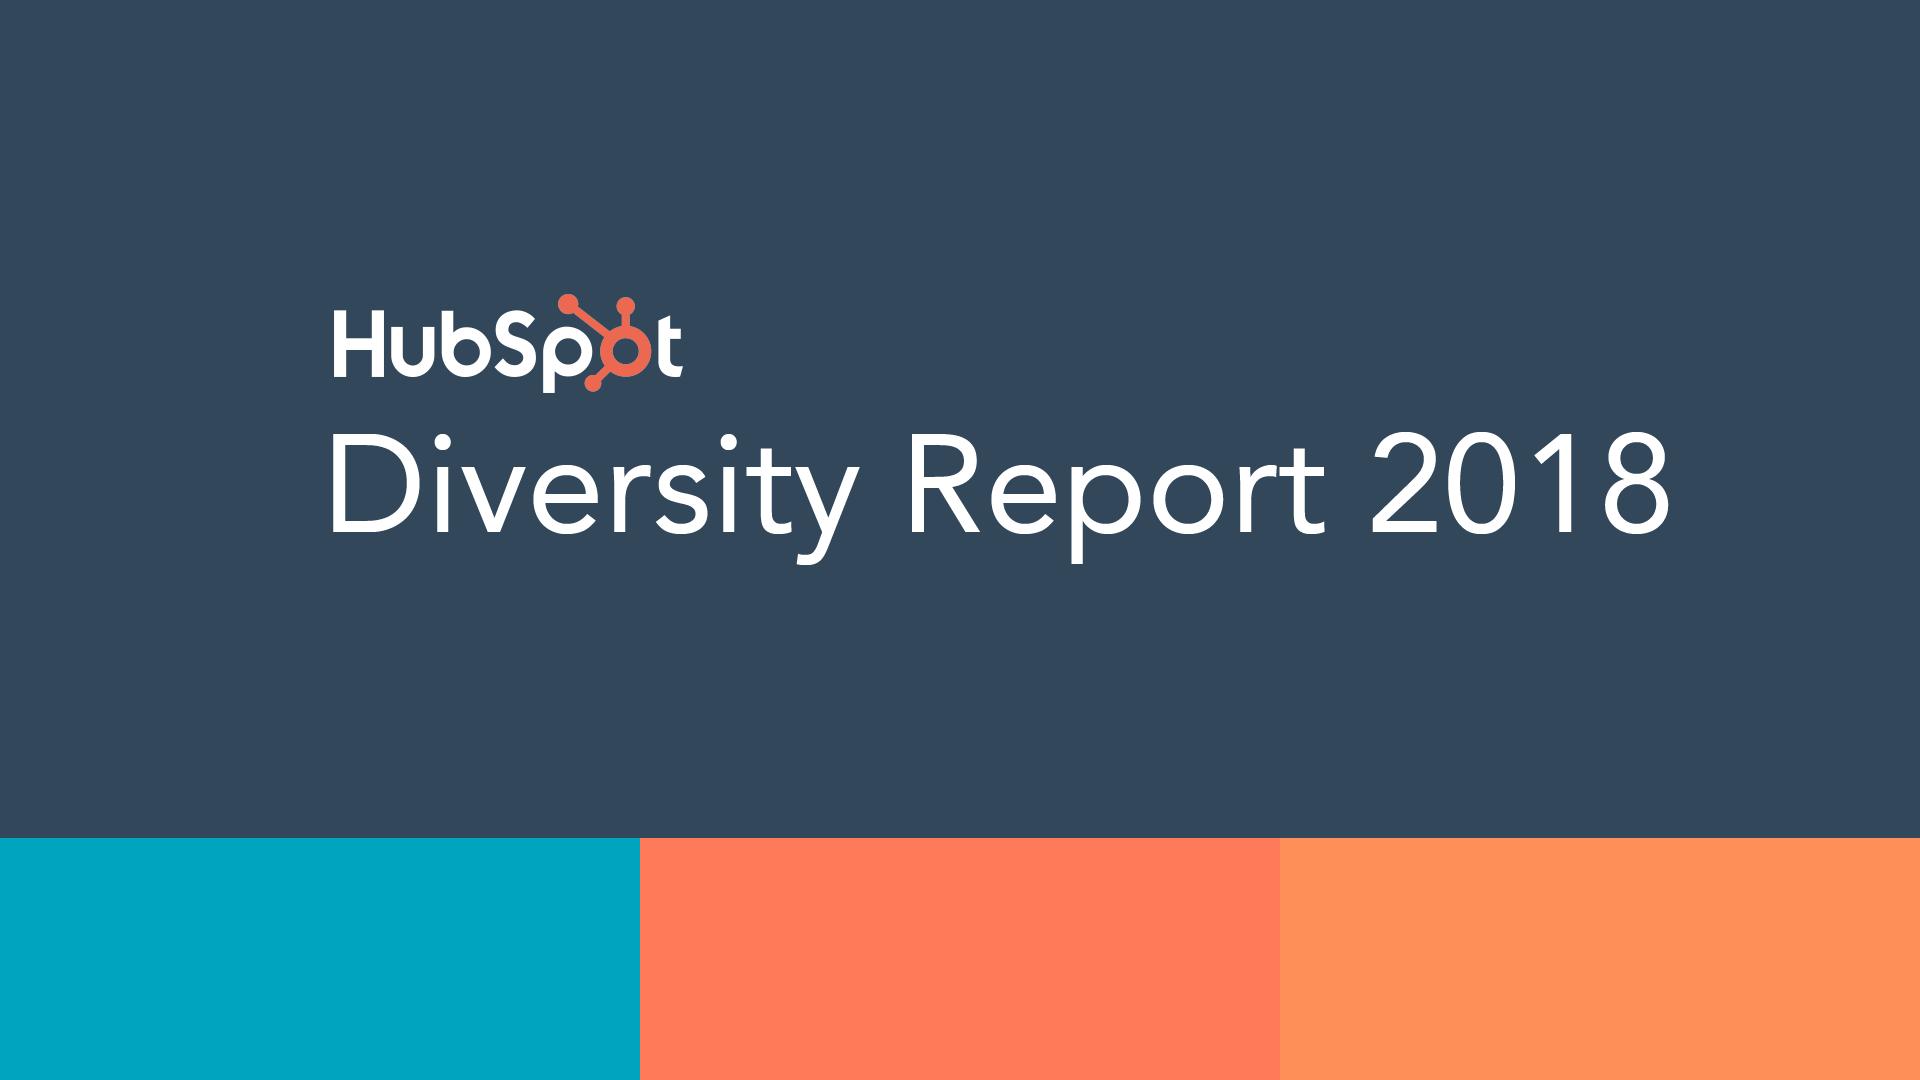 HubSpot Releases 2018 Diversity Report, Reflects on Progress